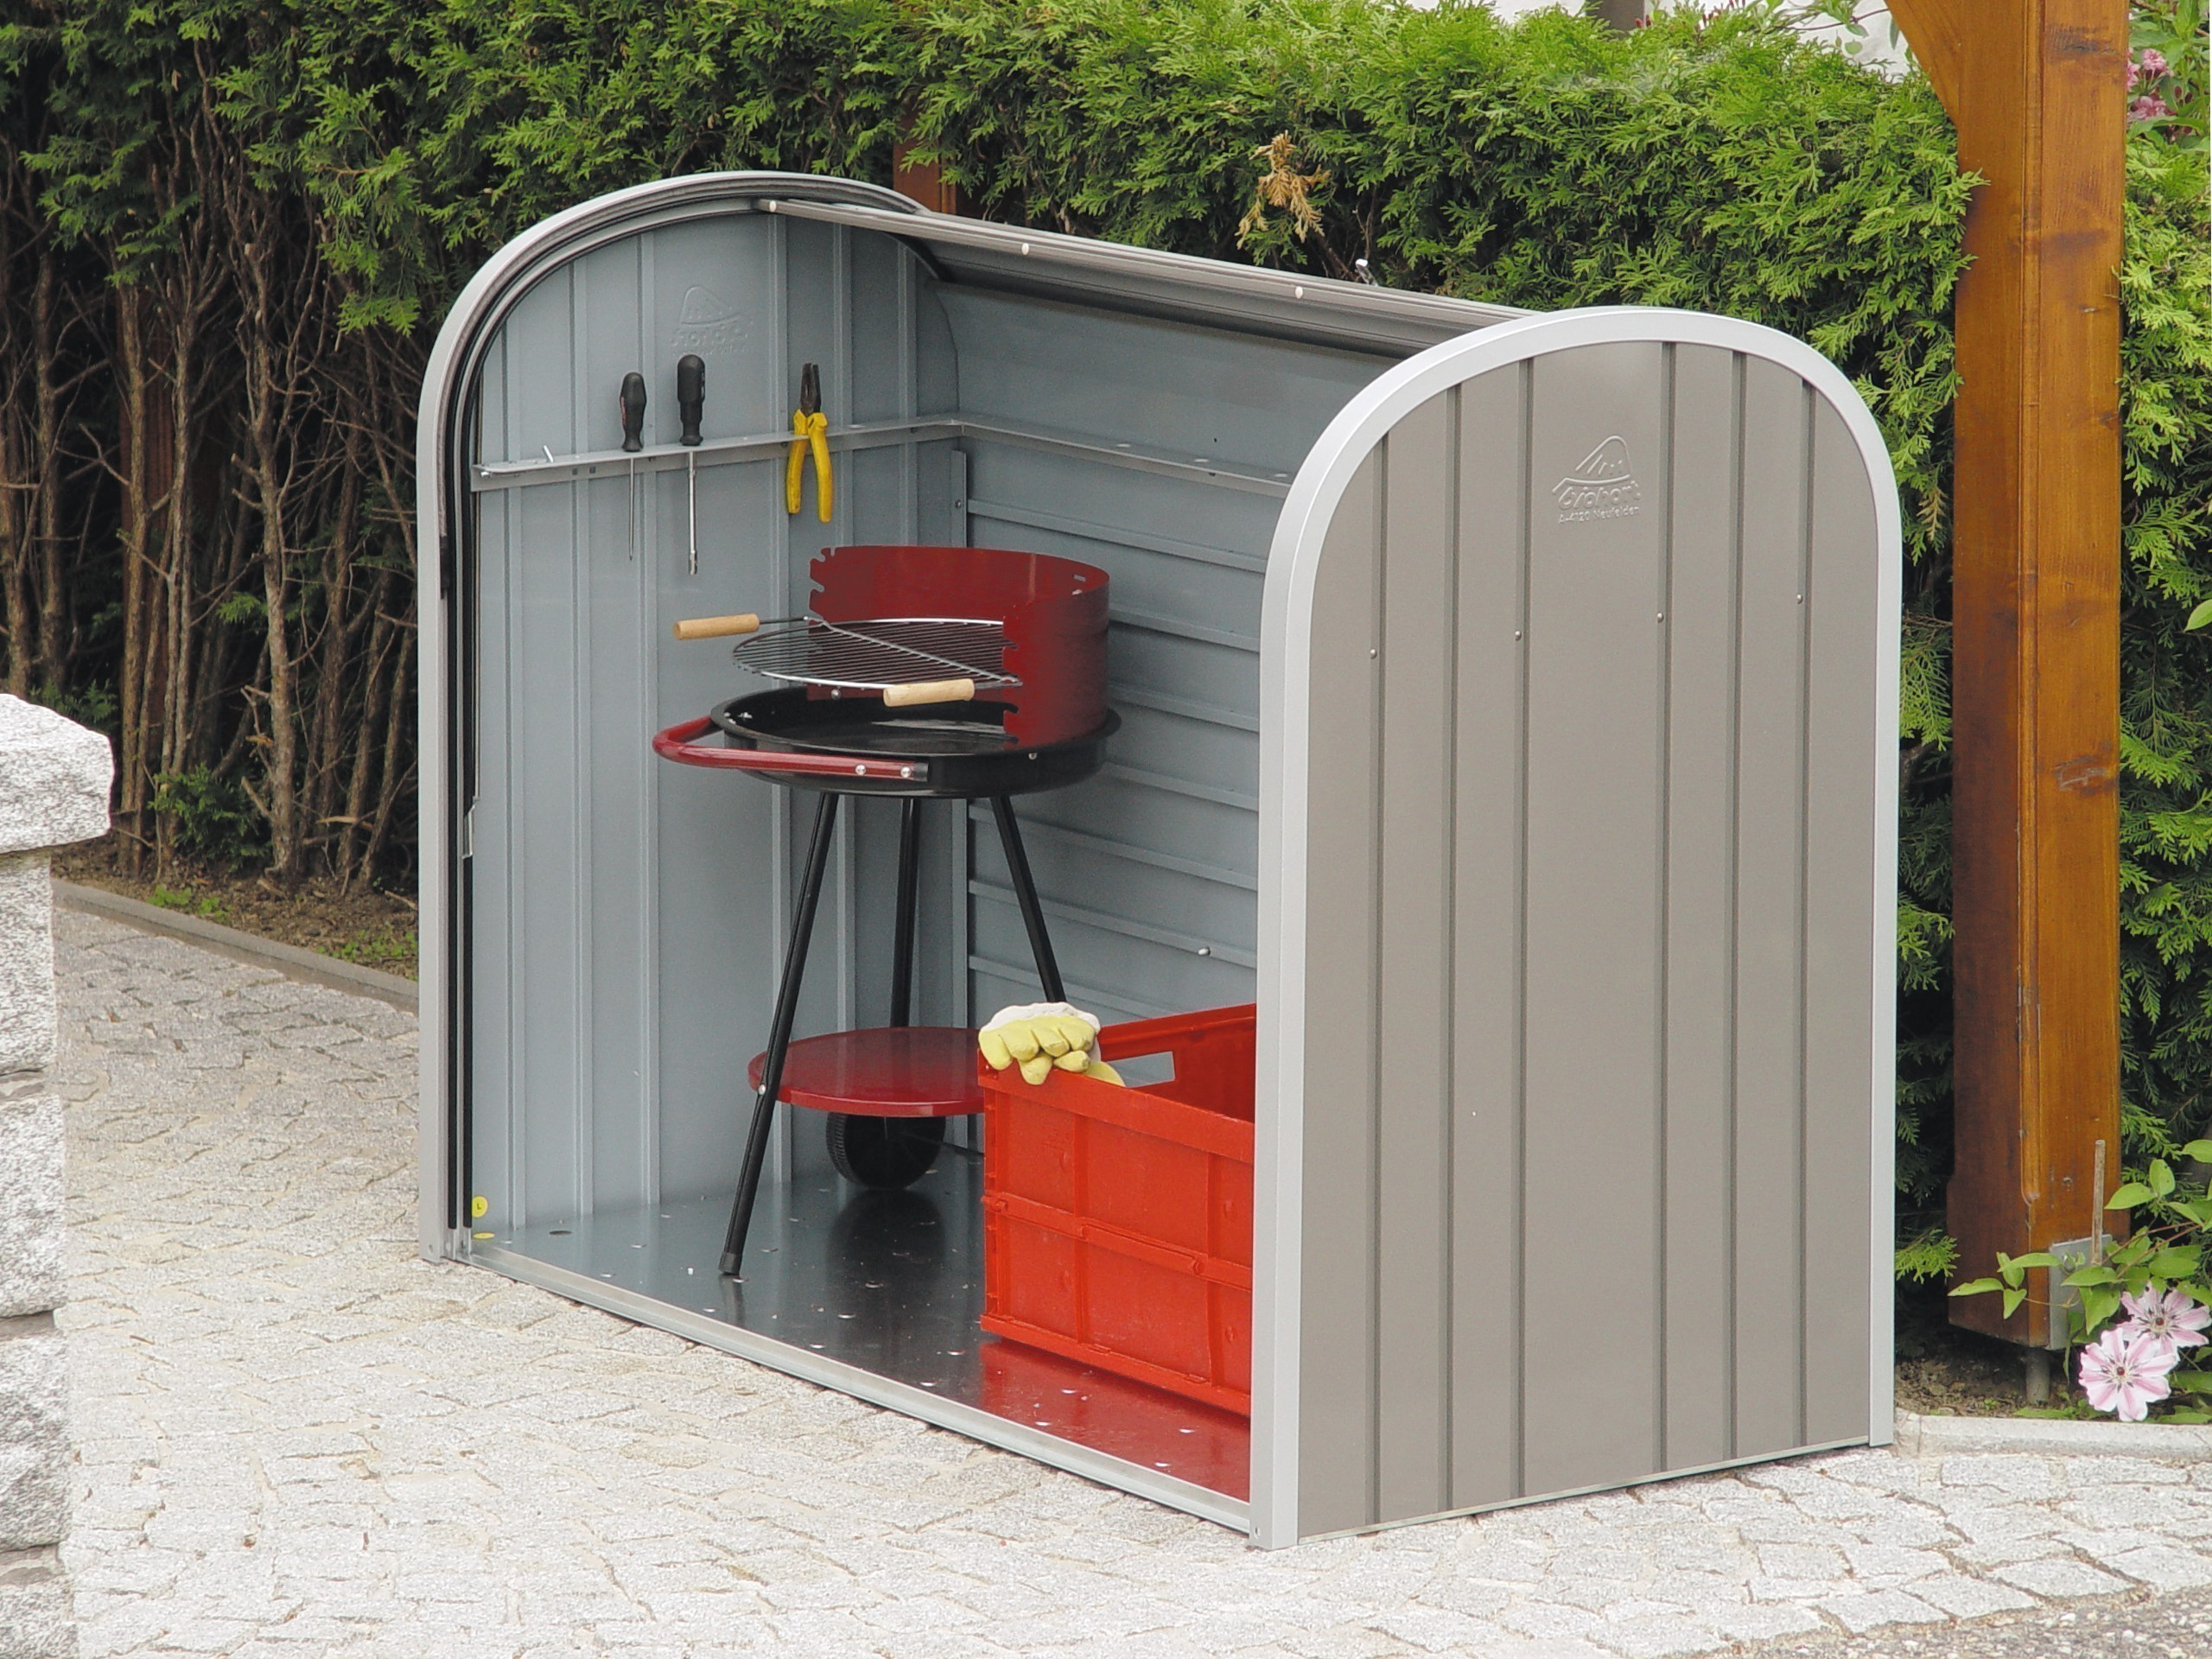 Gartenbox / Auflagenbox Biohort Storemax 160 quarzgrau Bild 3